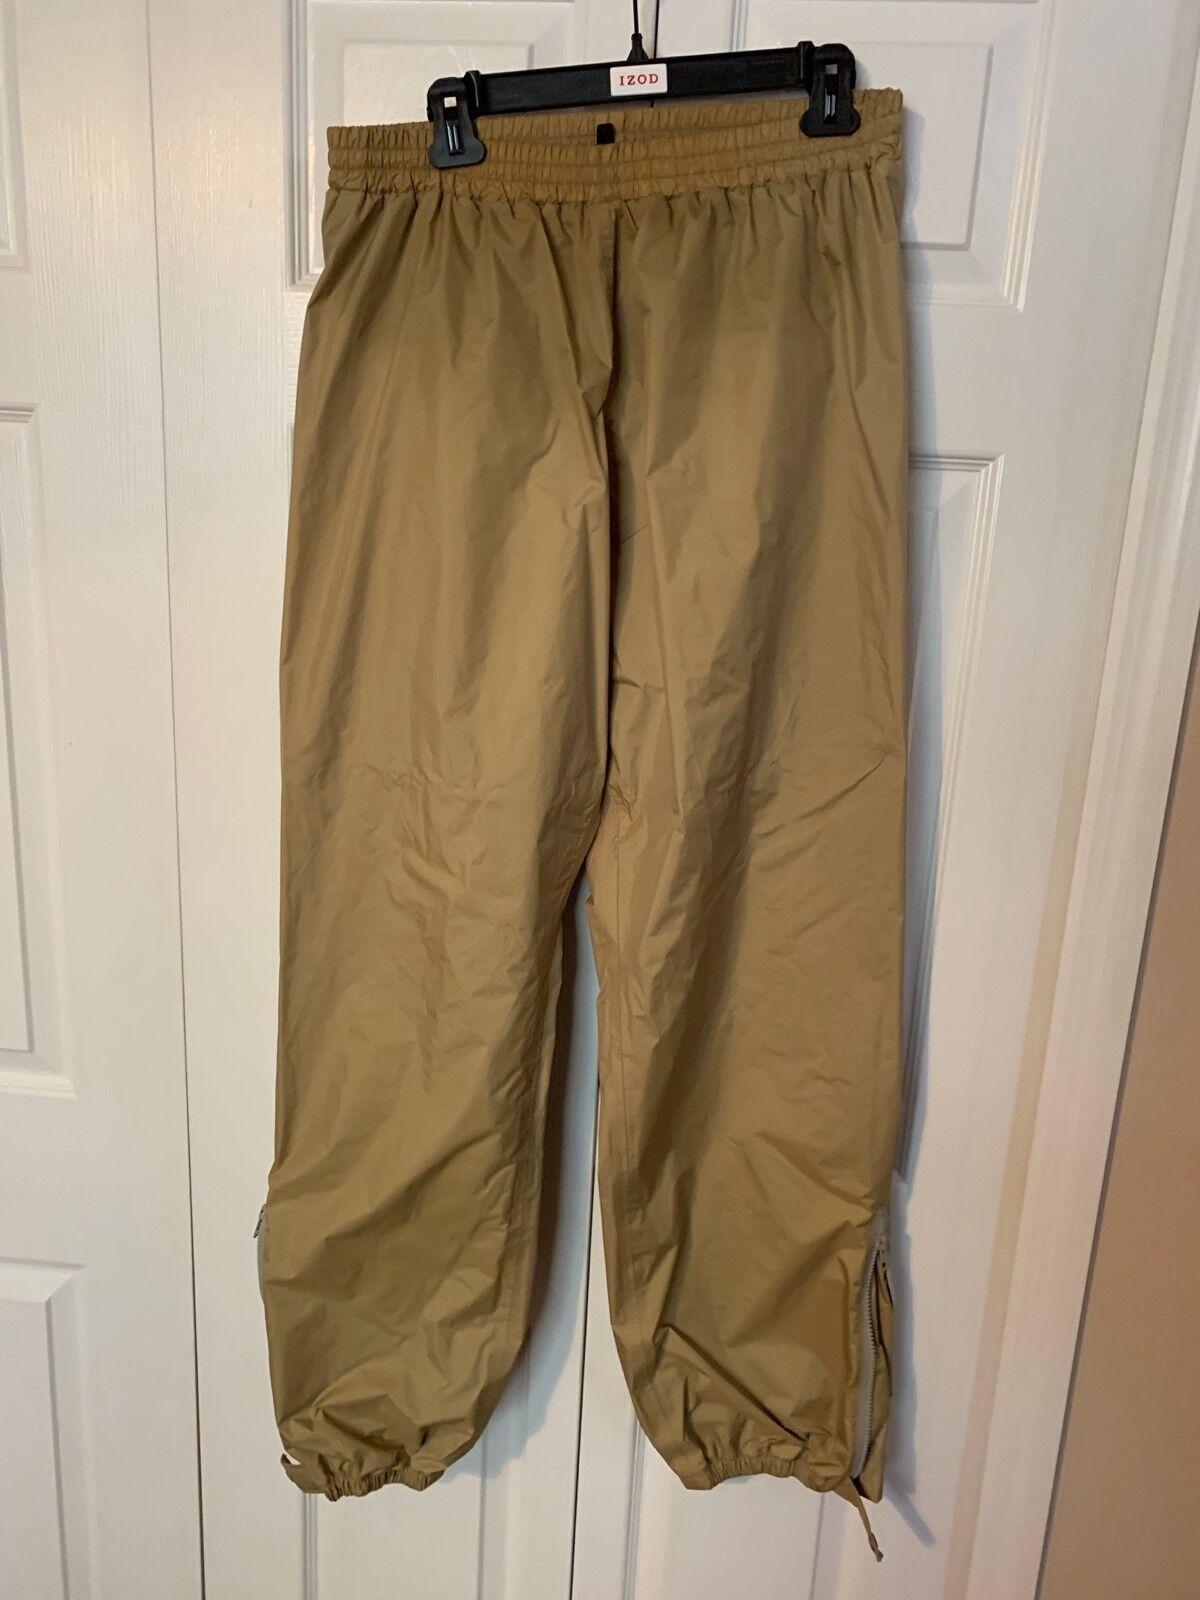 Ll bean Gore Tex Outerwear fishing Hunting  Pants, Size Medium  big savings